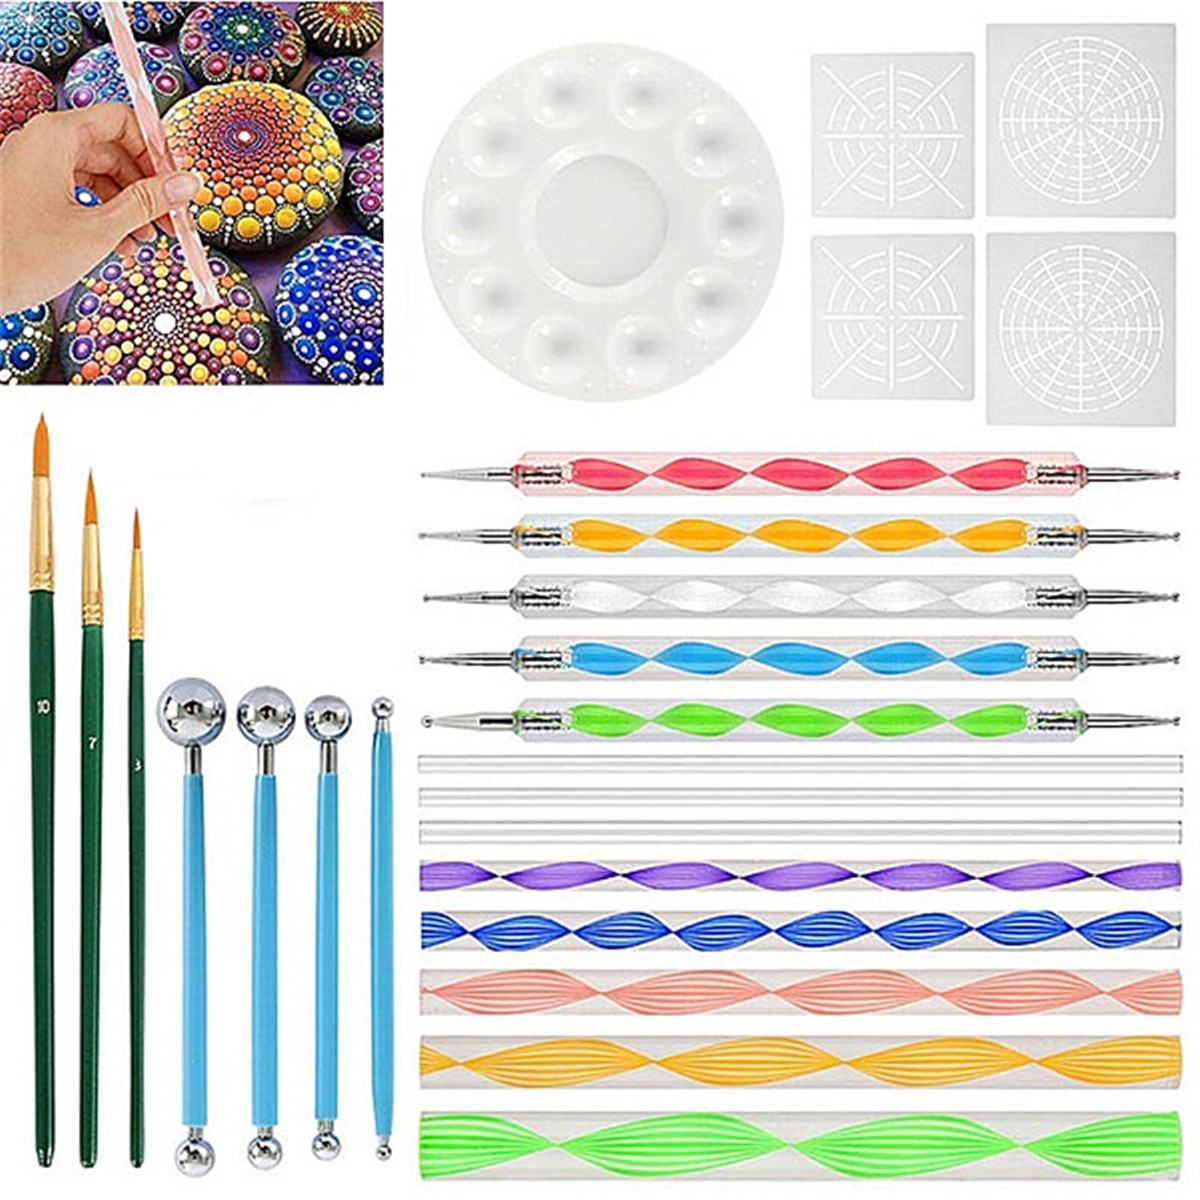 25 uds Mandala herramientas de punteo para pintar rocas pintura de Mandala Plantilla de punteo punto Mandala Kit de arte de pared de tela de roca de uñas